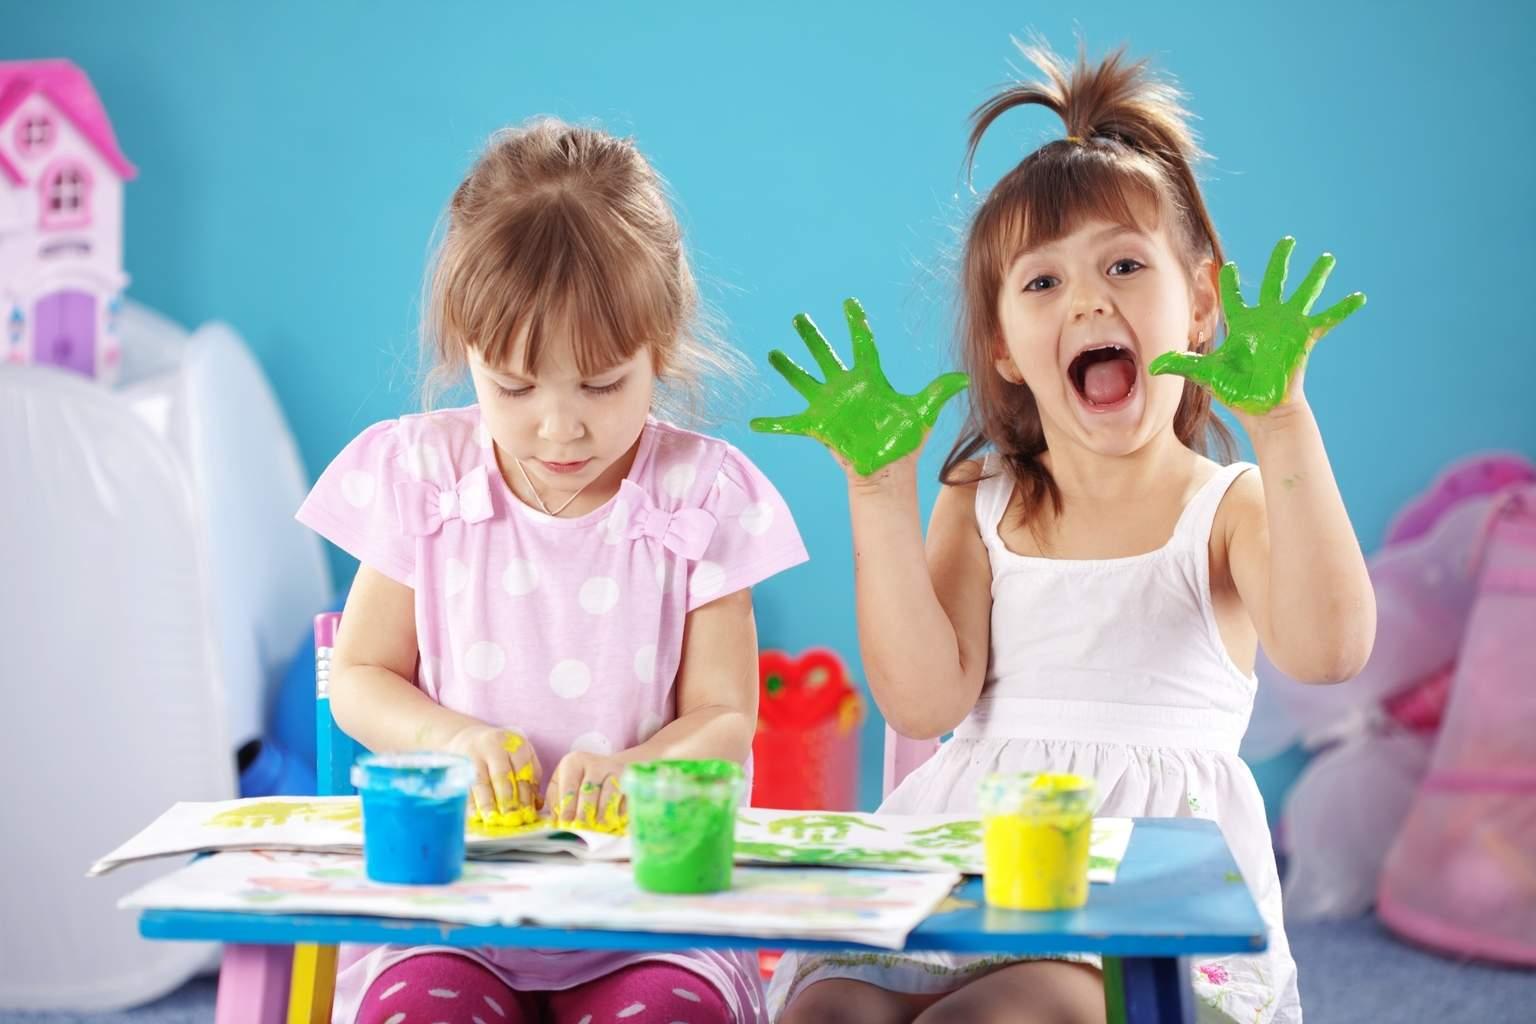 Planning-After-School-Activities-For-Your-Kids